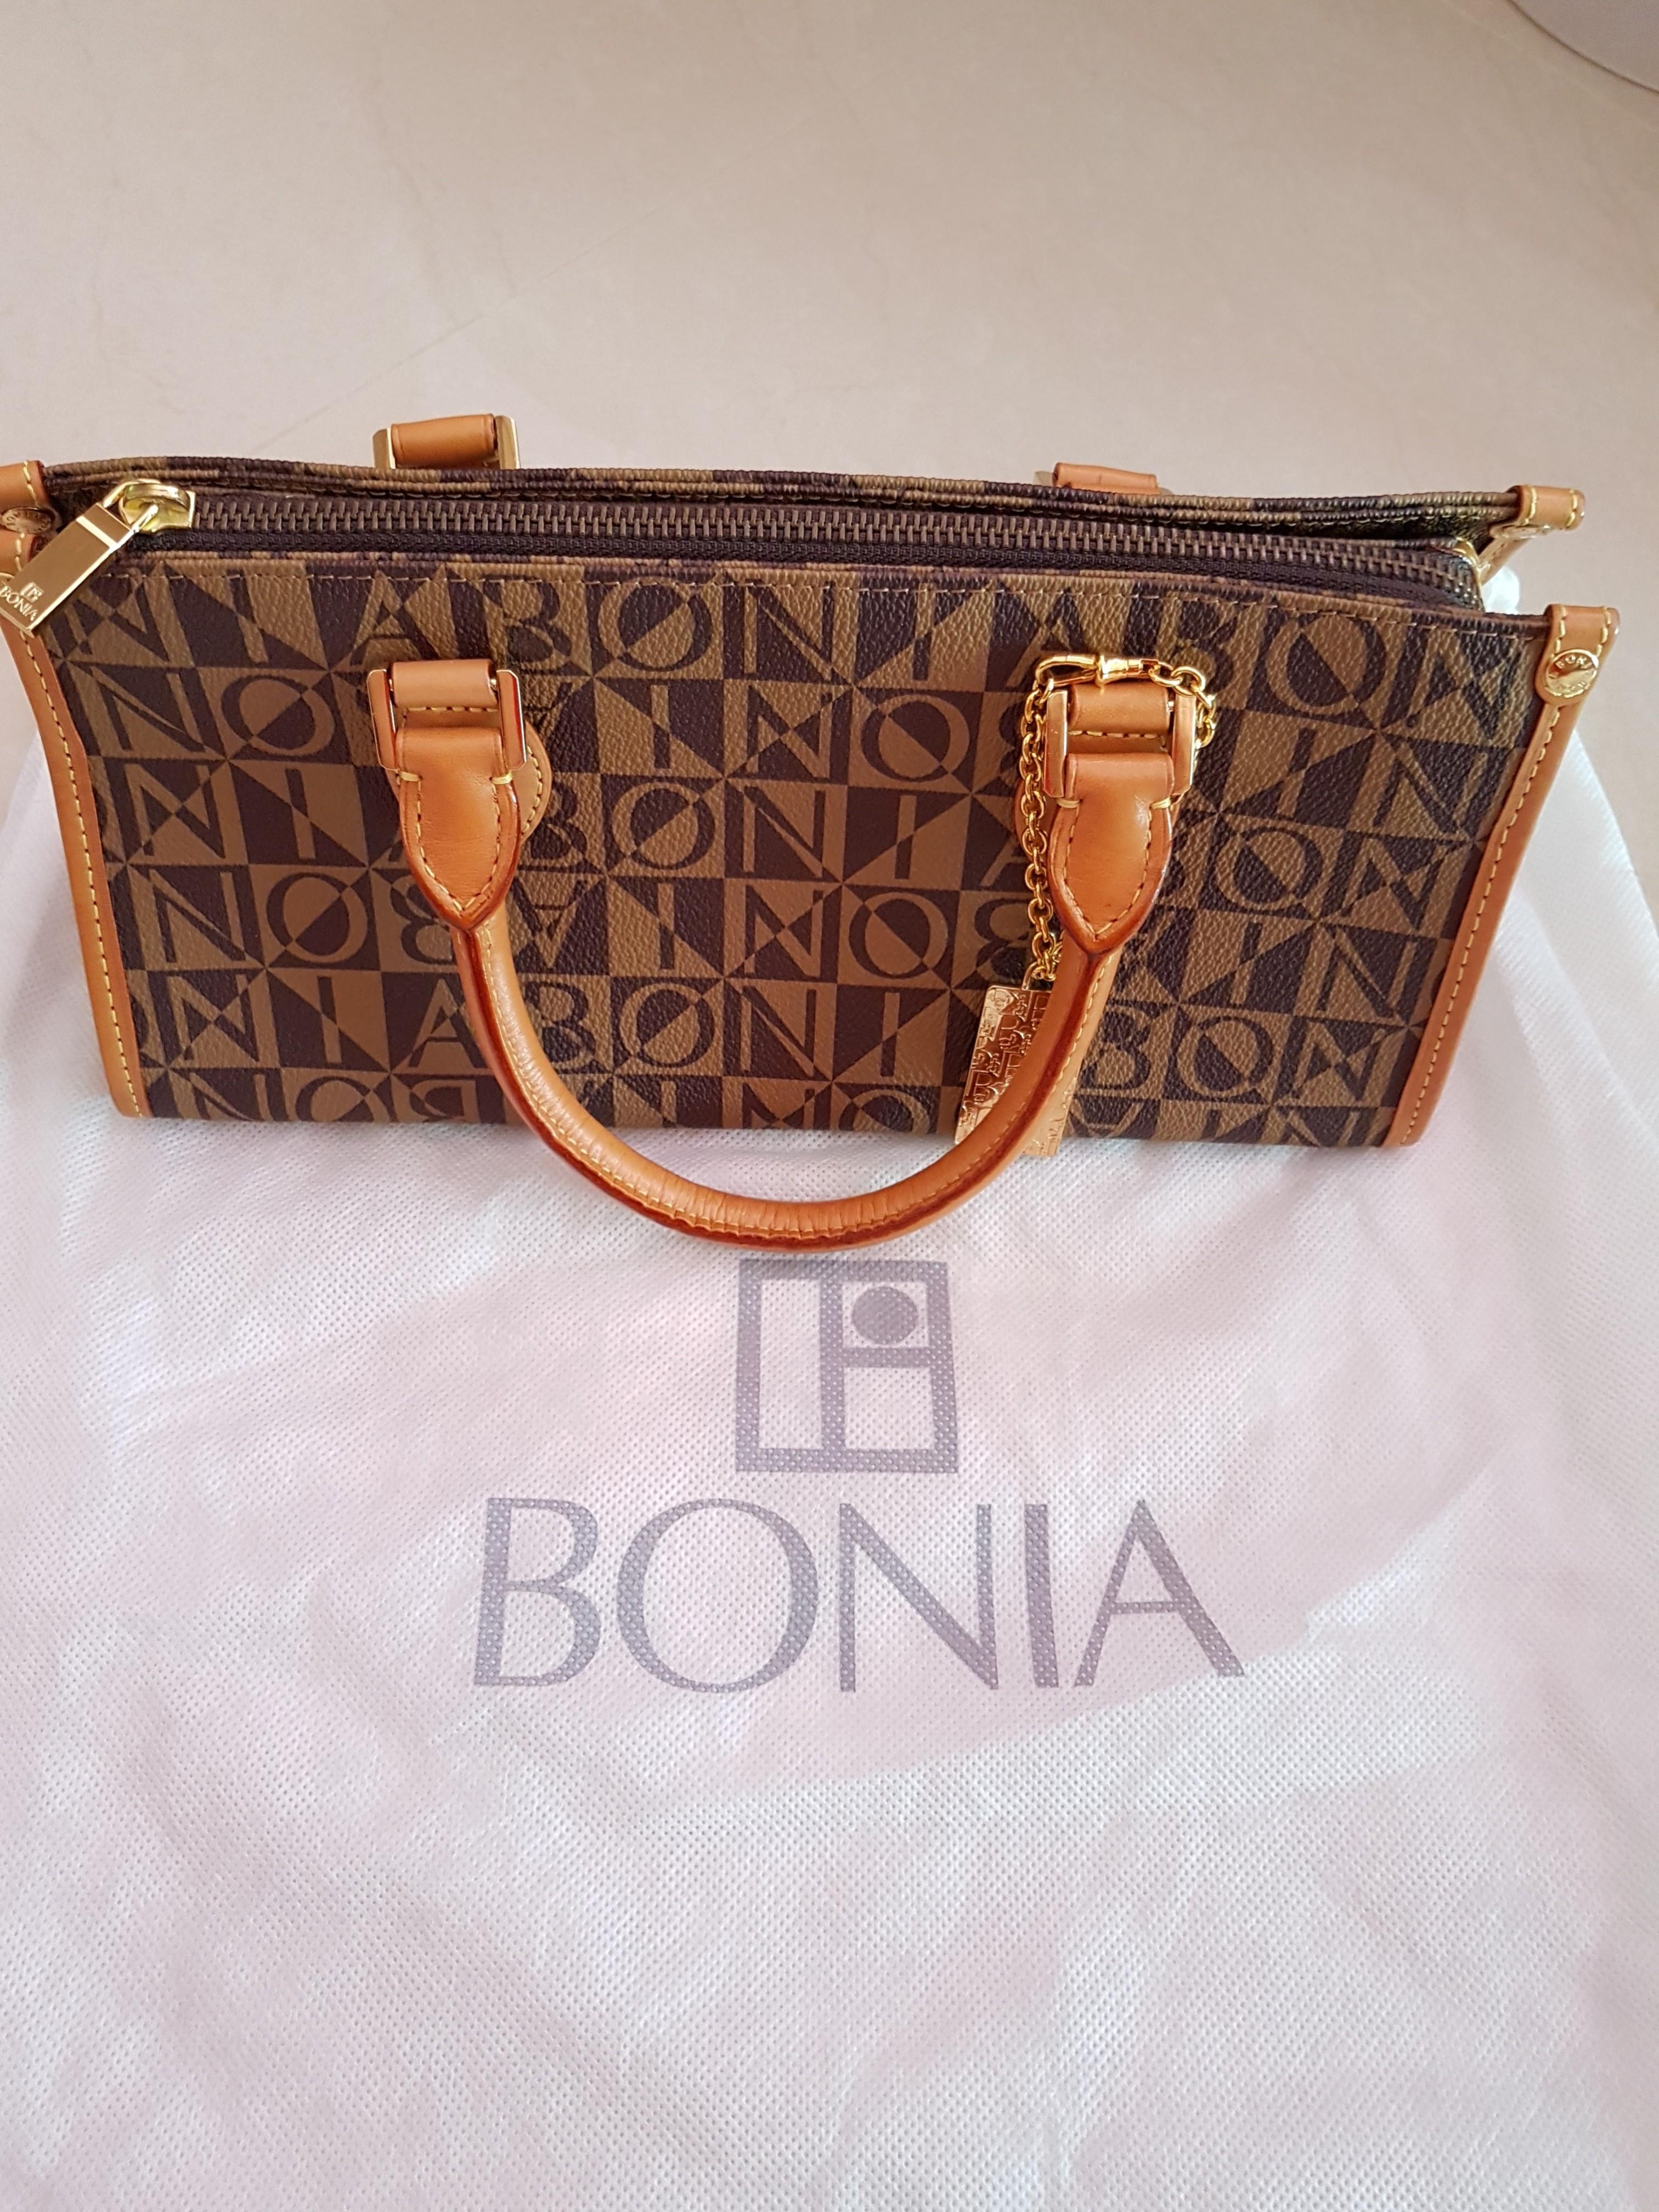 New Authentic Bonia Hand Bag Luxury Bags Wallets Handbags On Carou